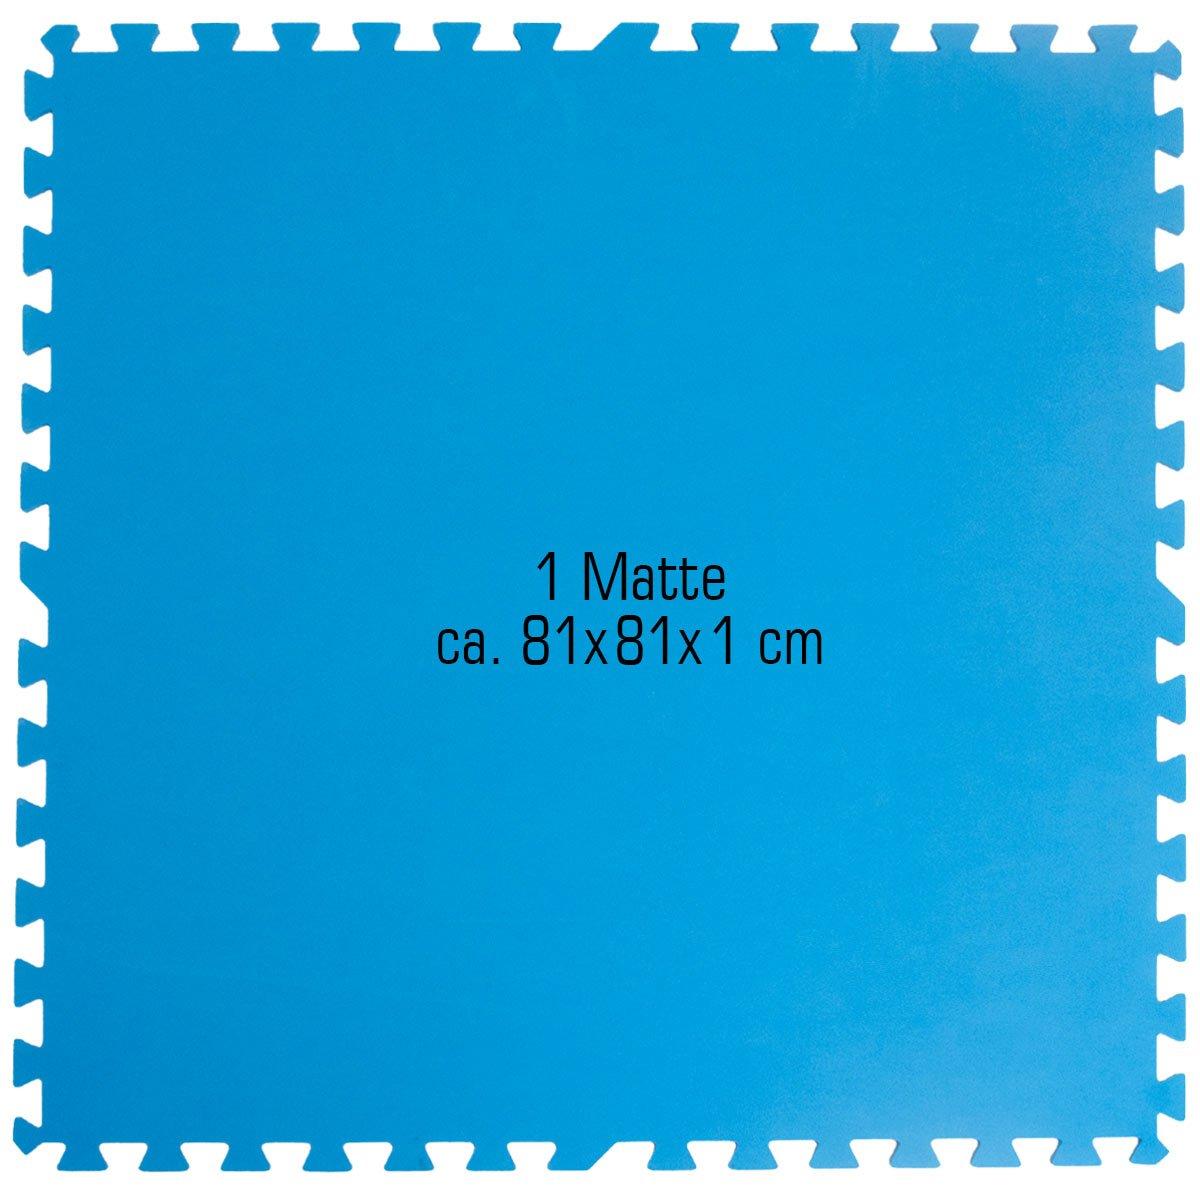 Eyepower Alfombra Puzle de Goma EVA para Cubrir Proteger Fondo Borde Piscina Ducha | 1cm de Espesor Suave Antideslizante Set 4pcs 2, 6qm Extensible | Azul: ...